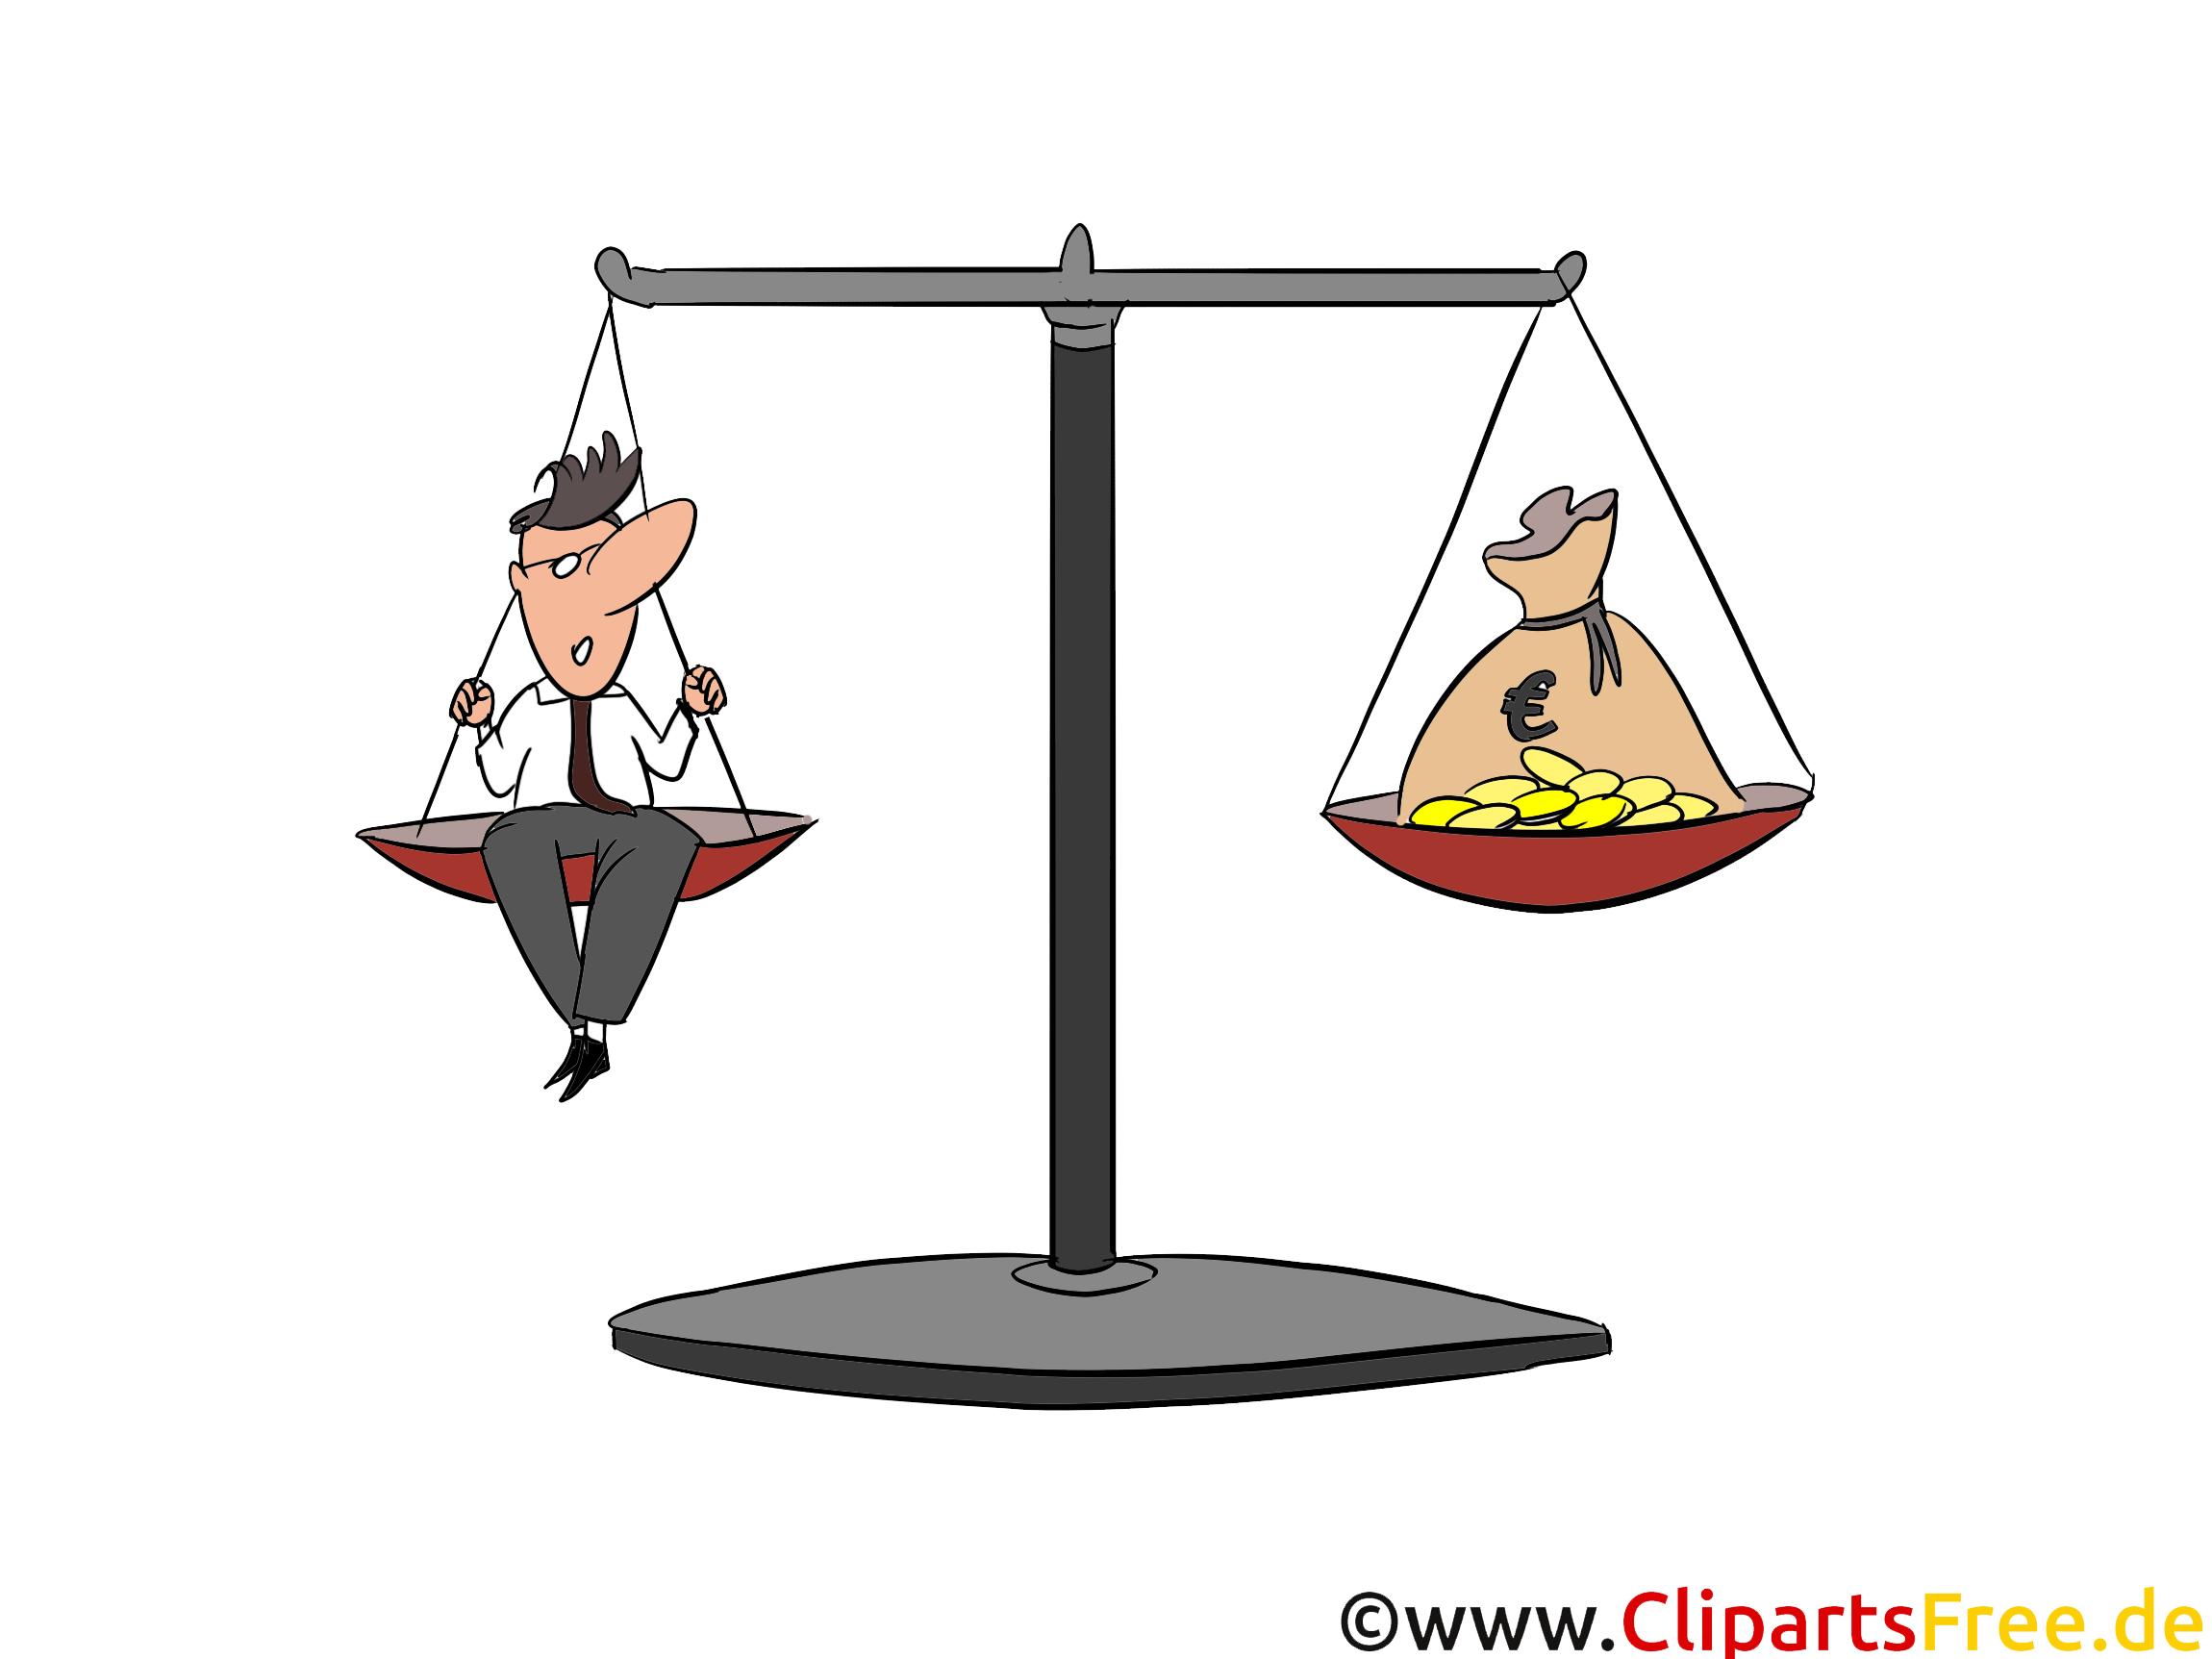 Waage mit Geld Clip Art, Bild, Cartoon, Comic, Illustration, Grafik kostenlos